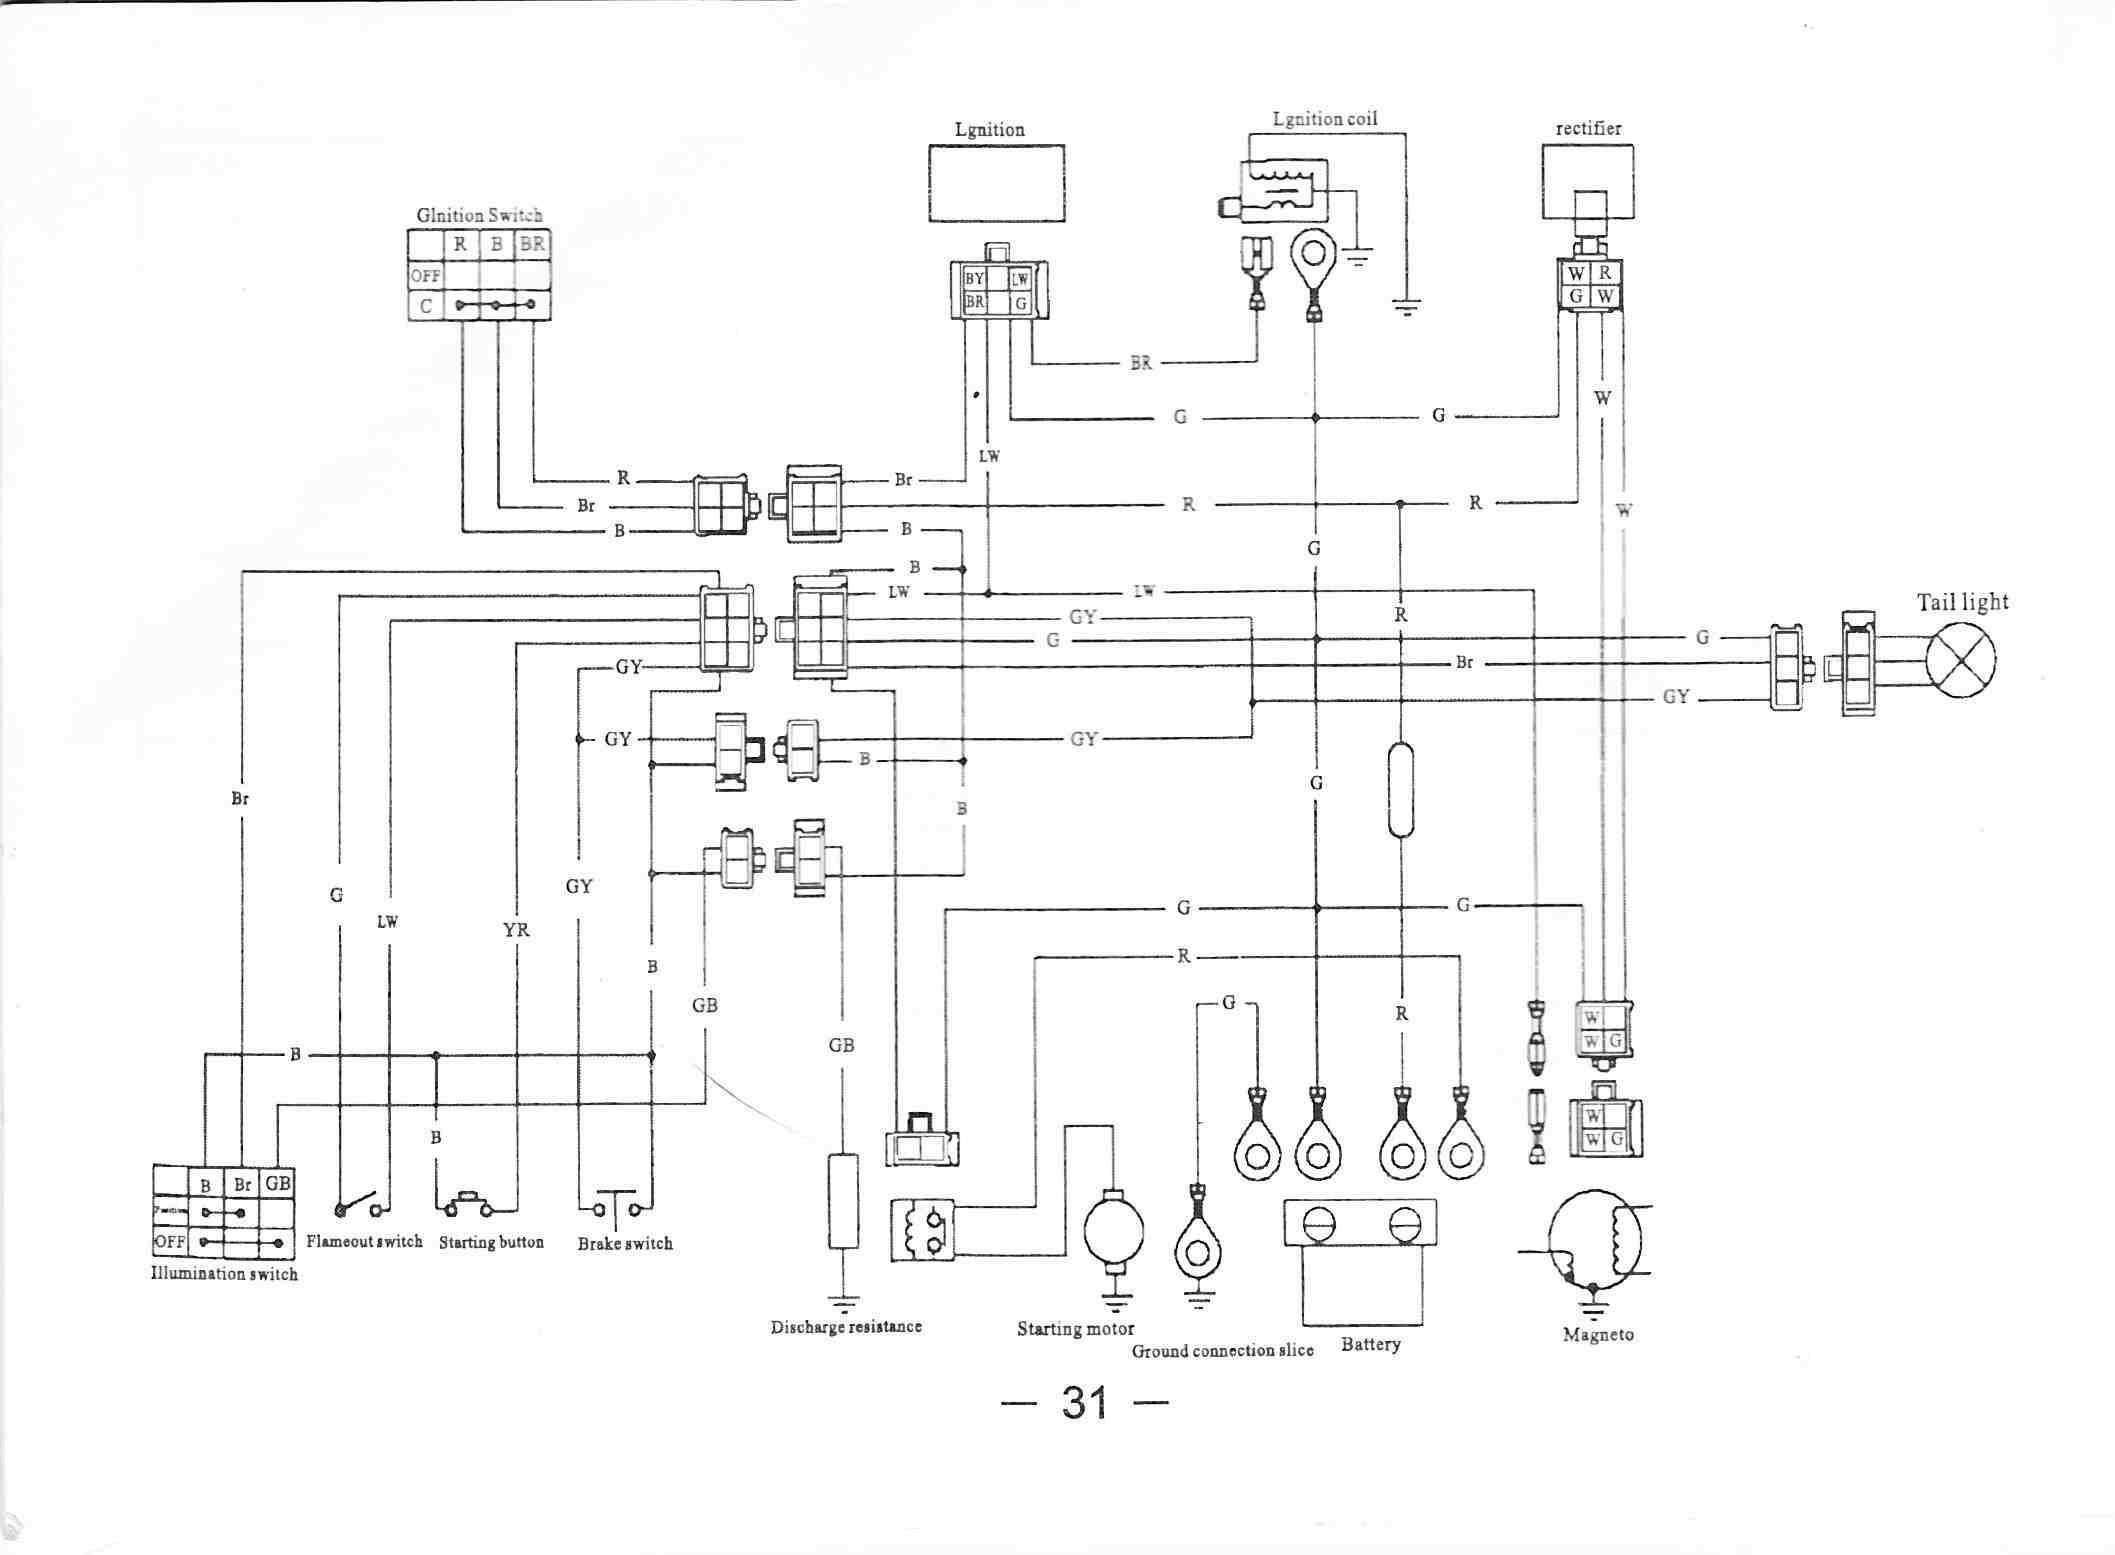 chinese quad wiring diagram elegant chinese atv wiring diagram 110 lovely 1999 yamaha atv 250 wiring of chinese quad wiring diagram?w=500 roketum 150cc atv wiring diagram